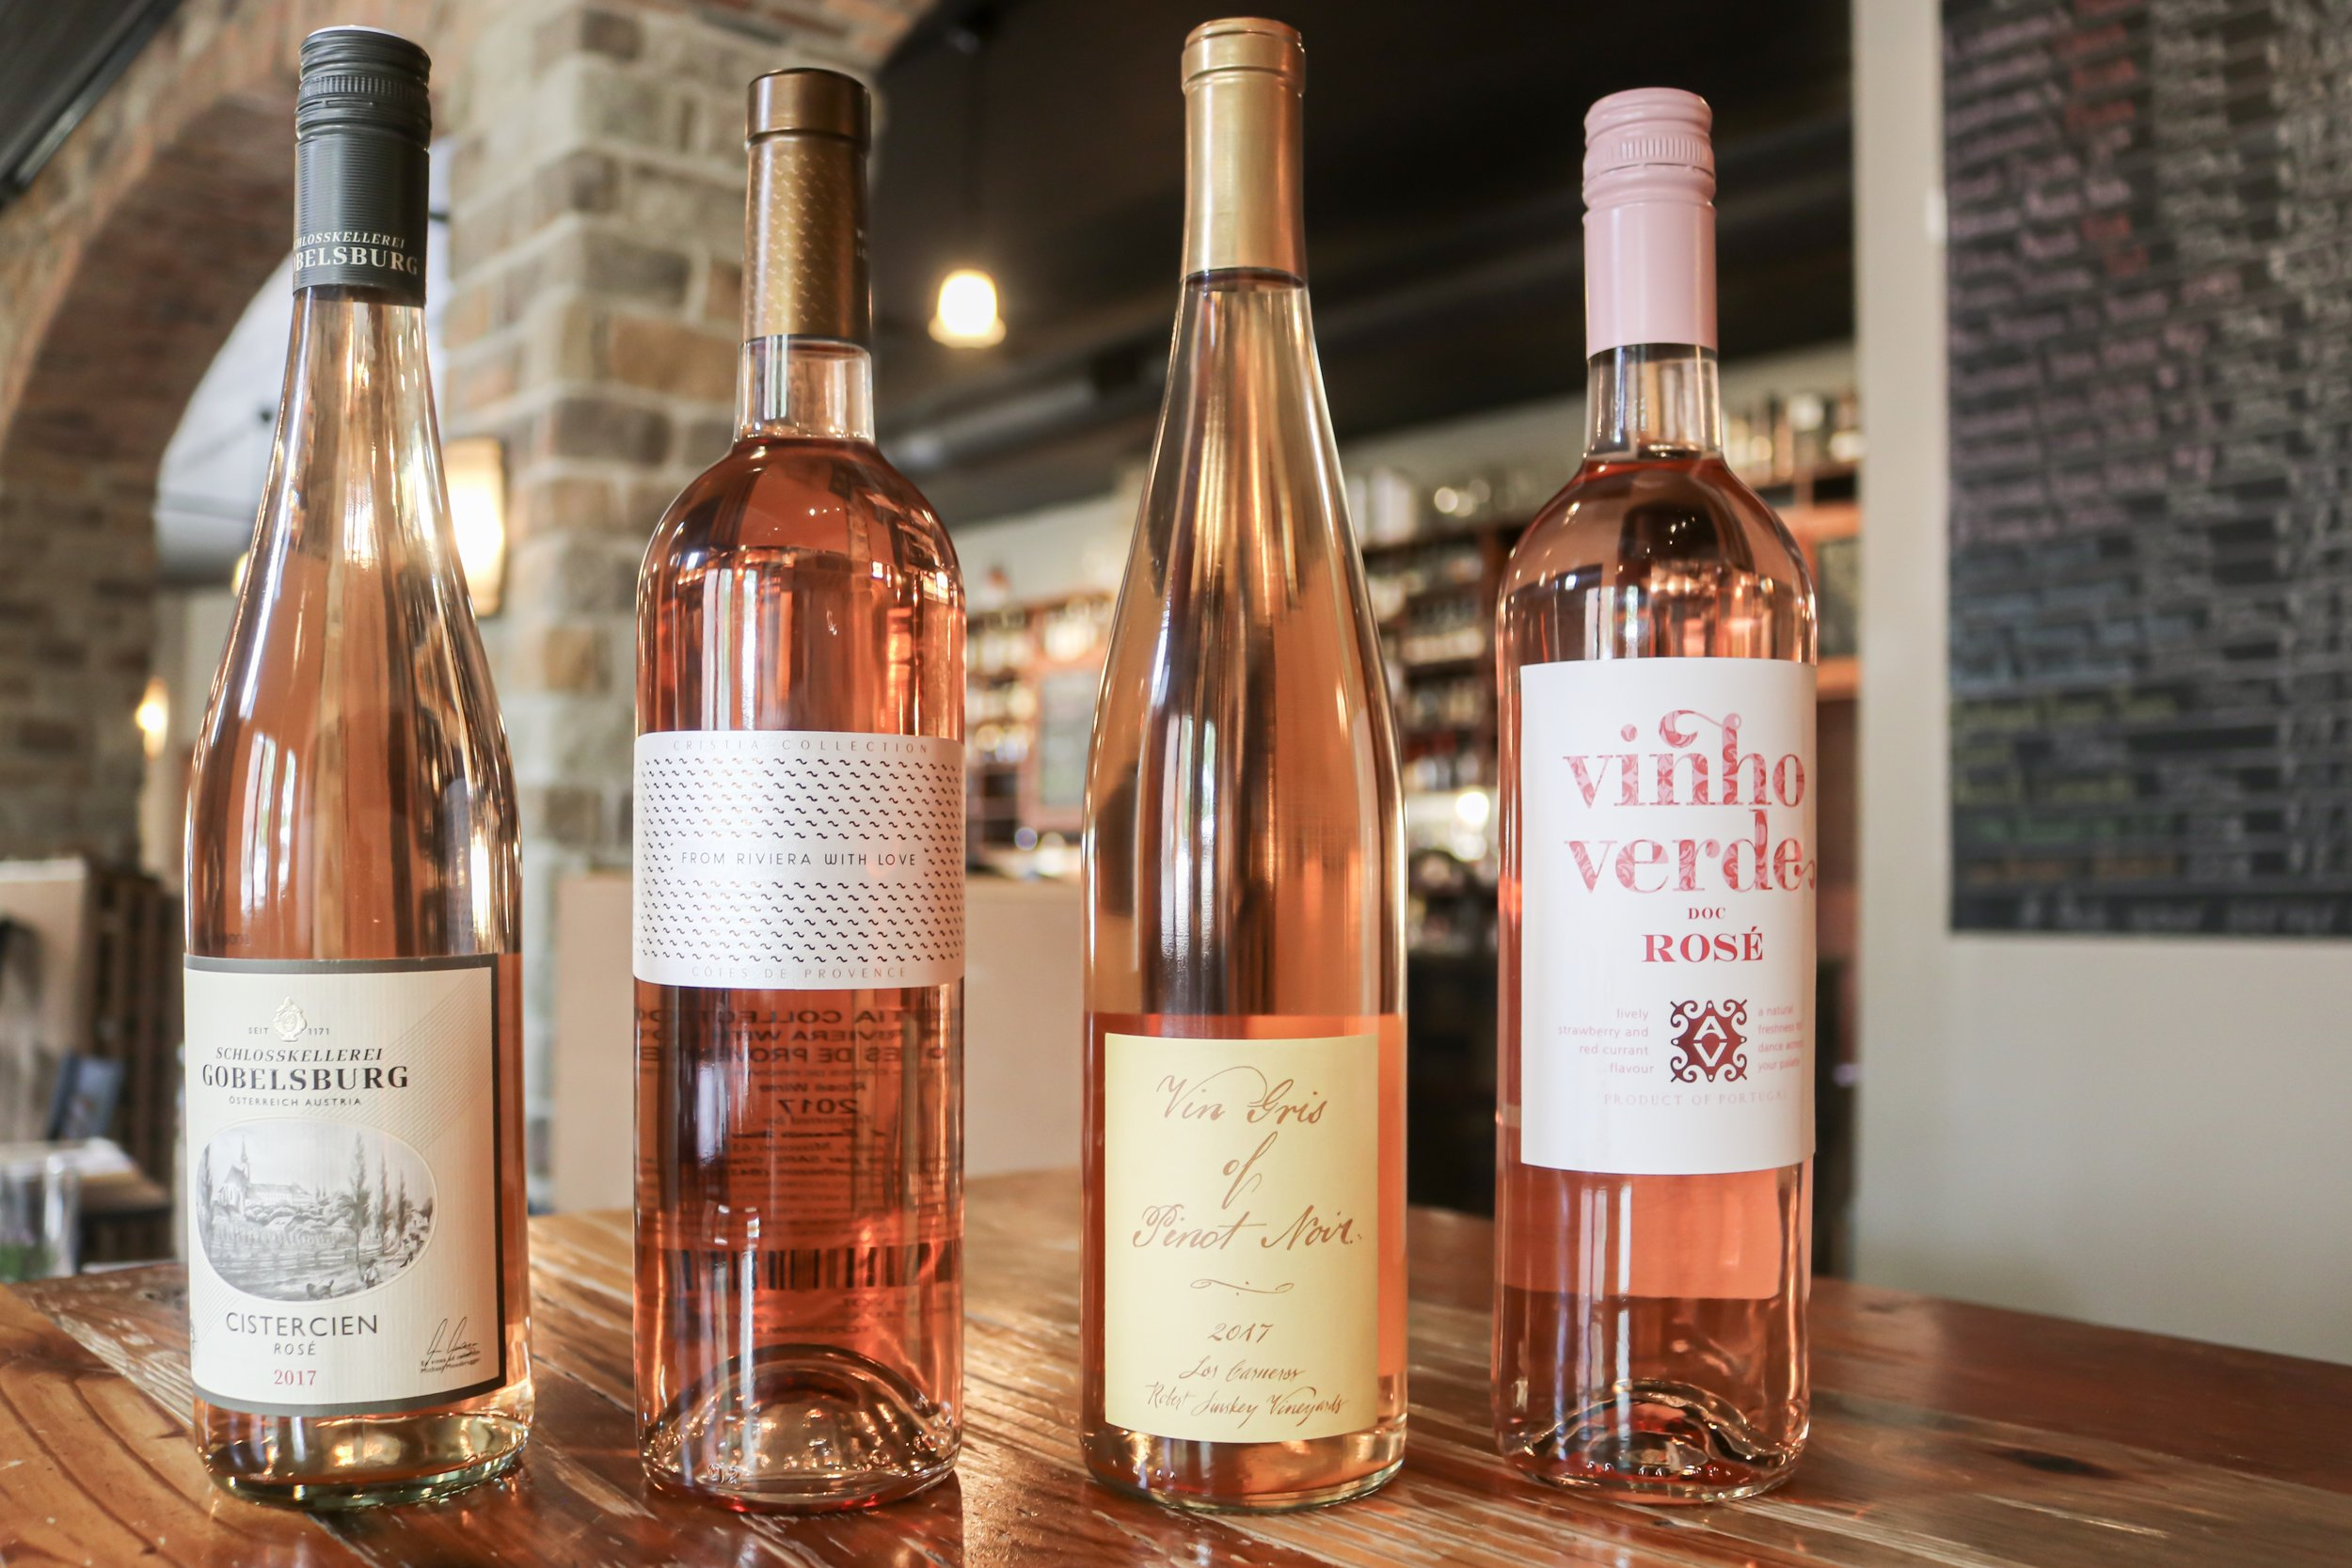 Just A Taste | St. James, MO | Rosé Wine